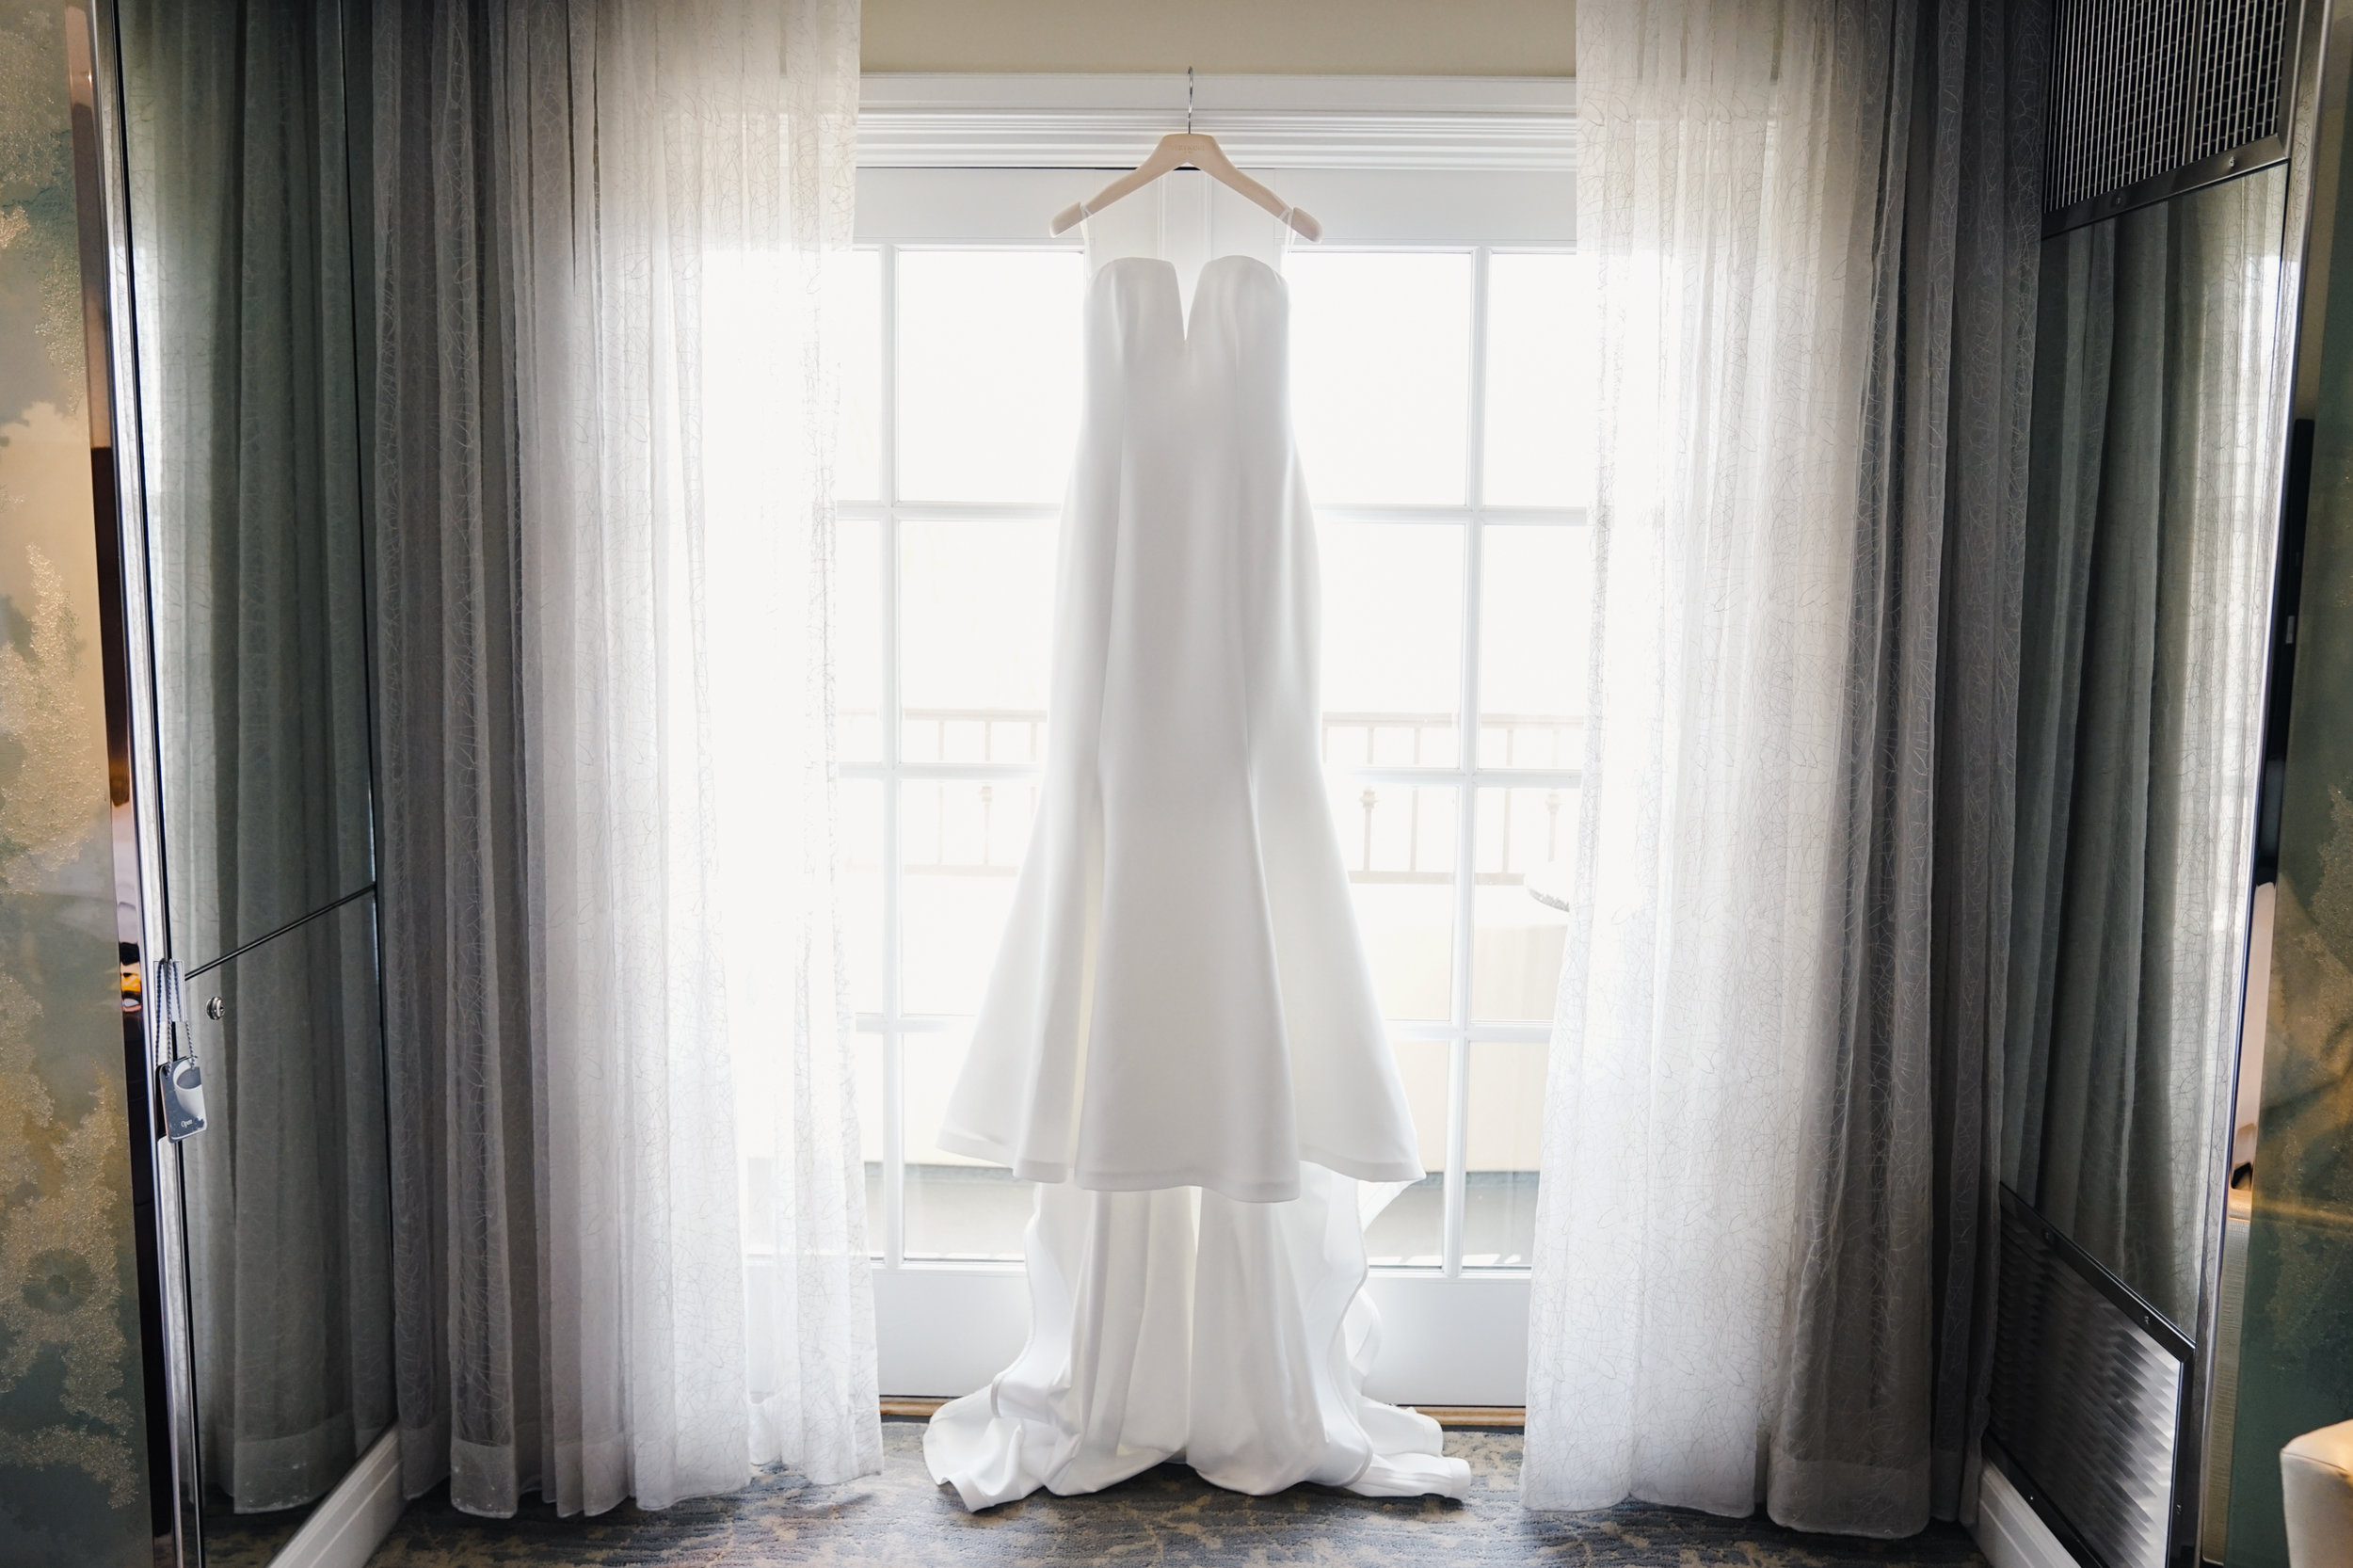 ritz-carlton-laguna-niguel-wedding-sonya_0003.JPG